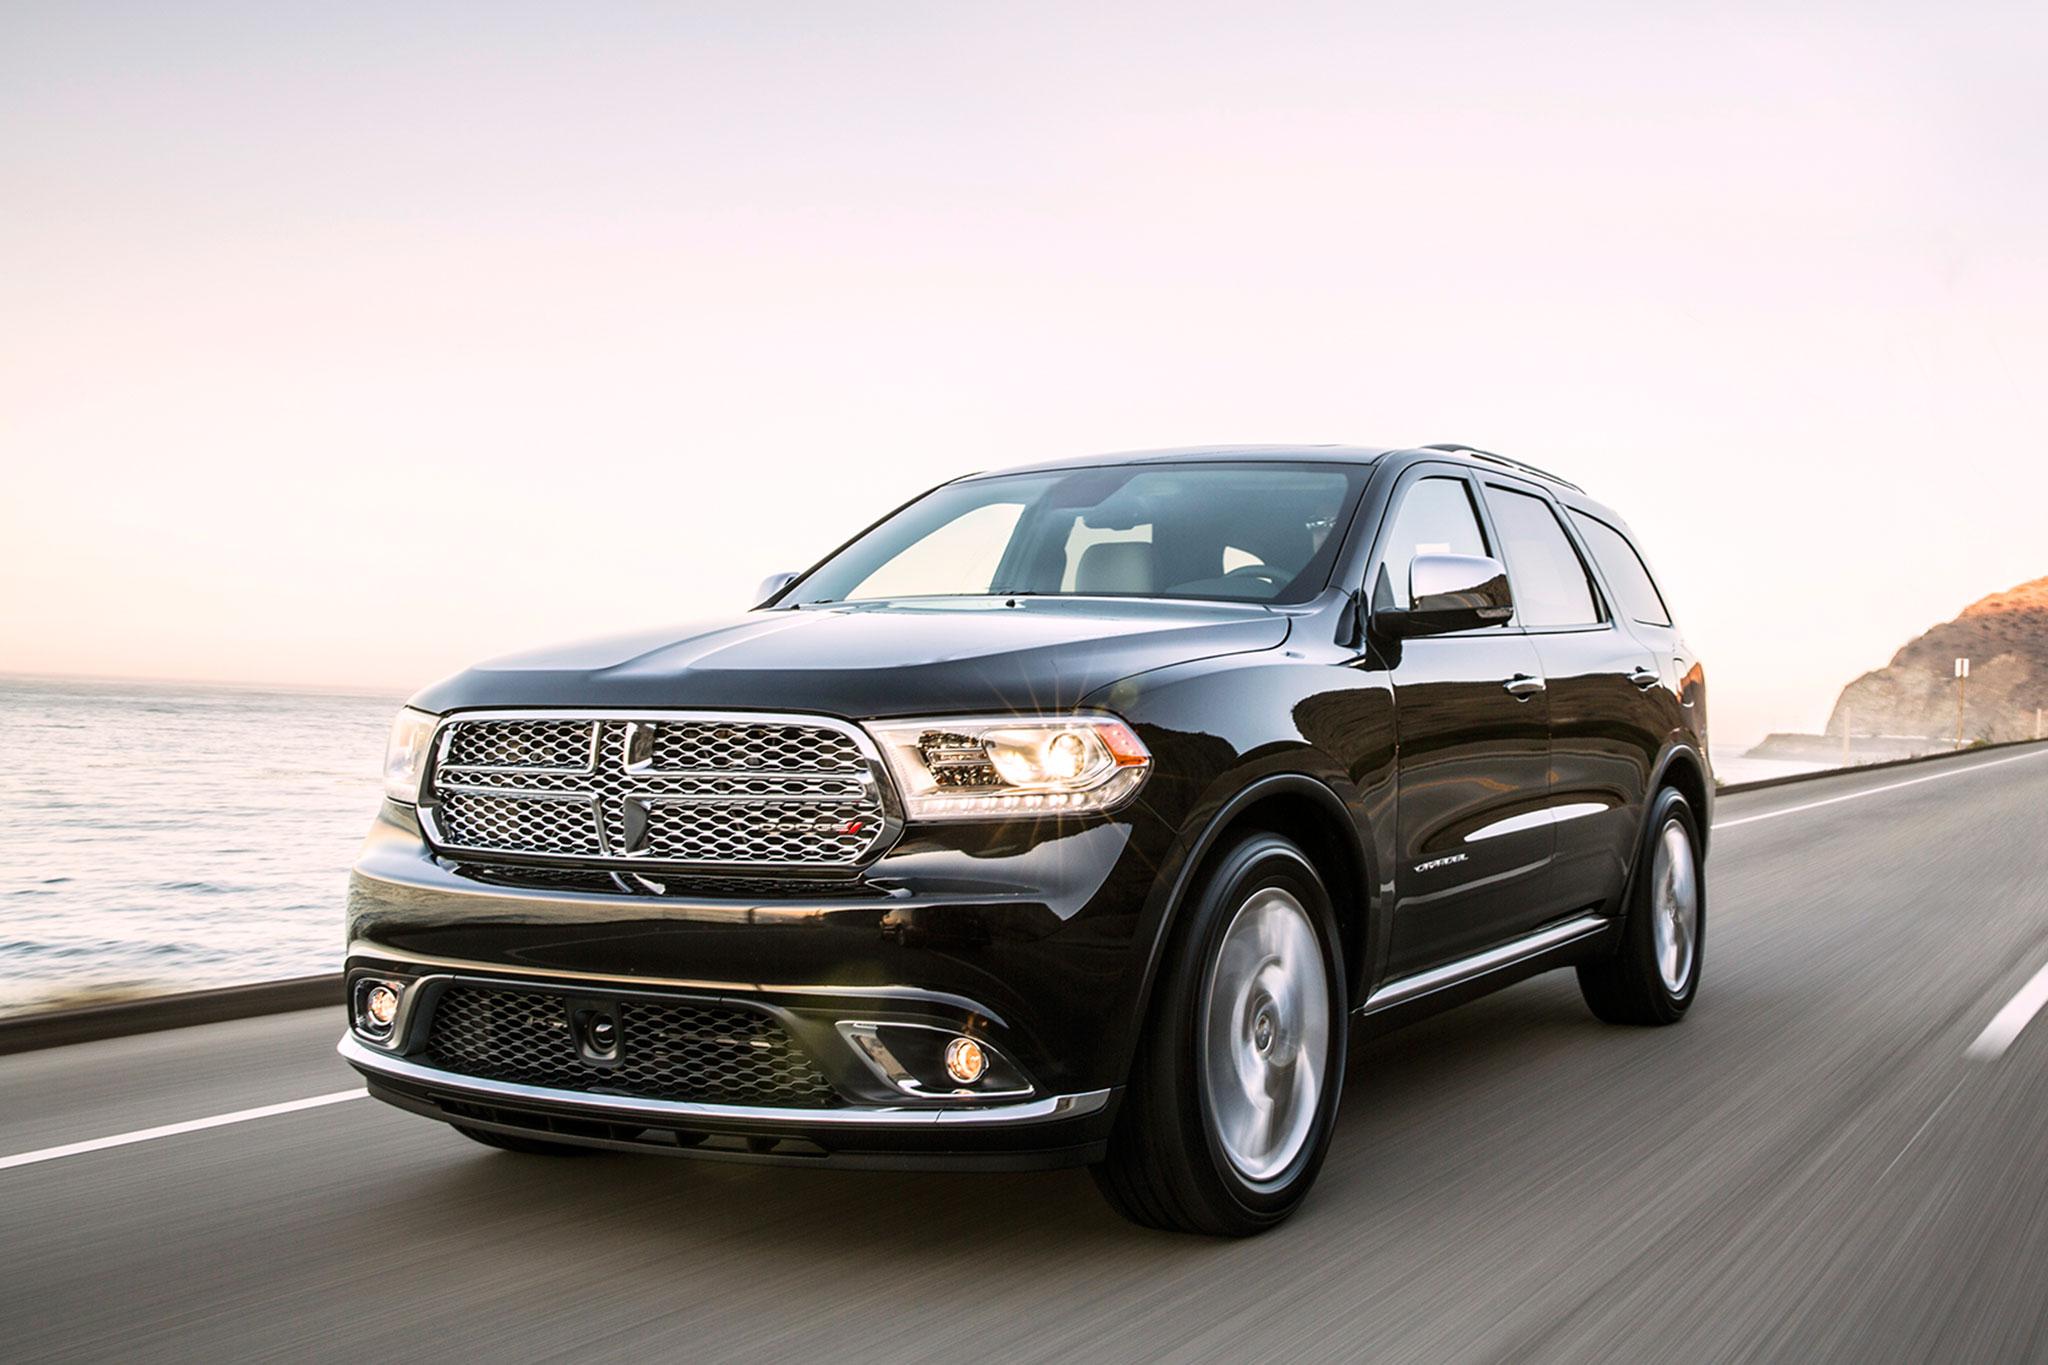 2014 dodge durango first drive - automobile magazine